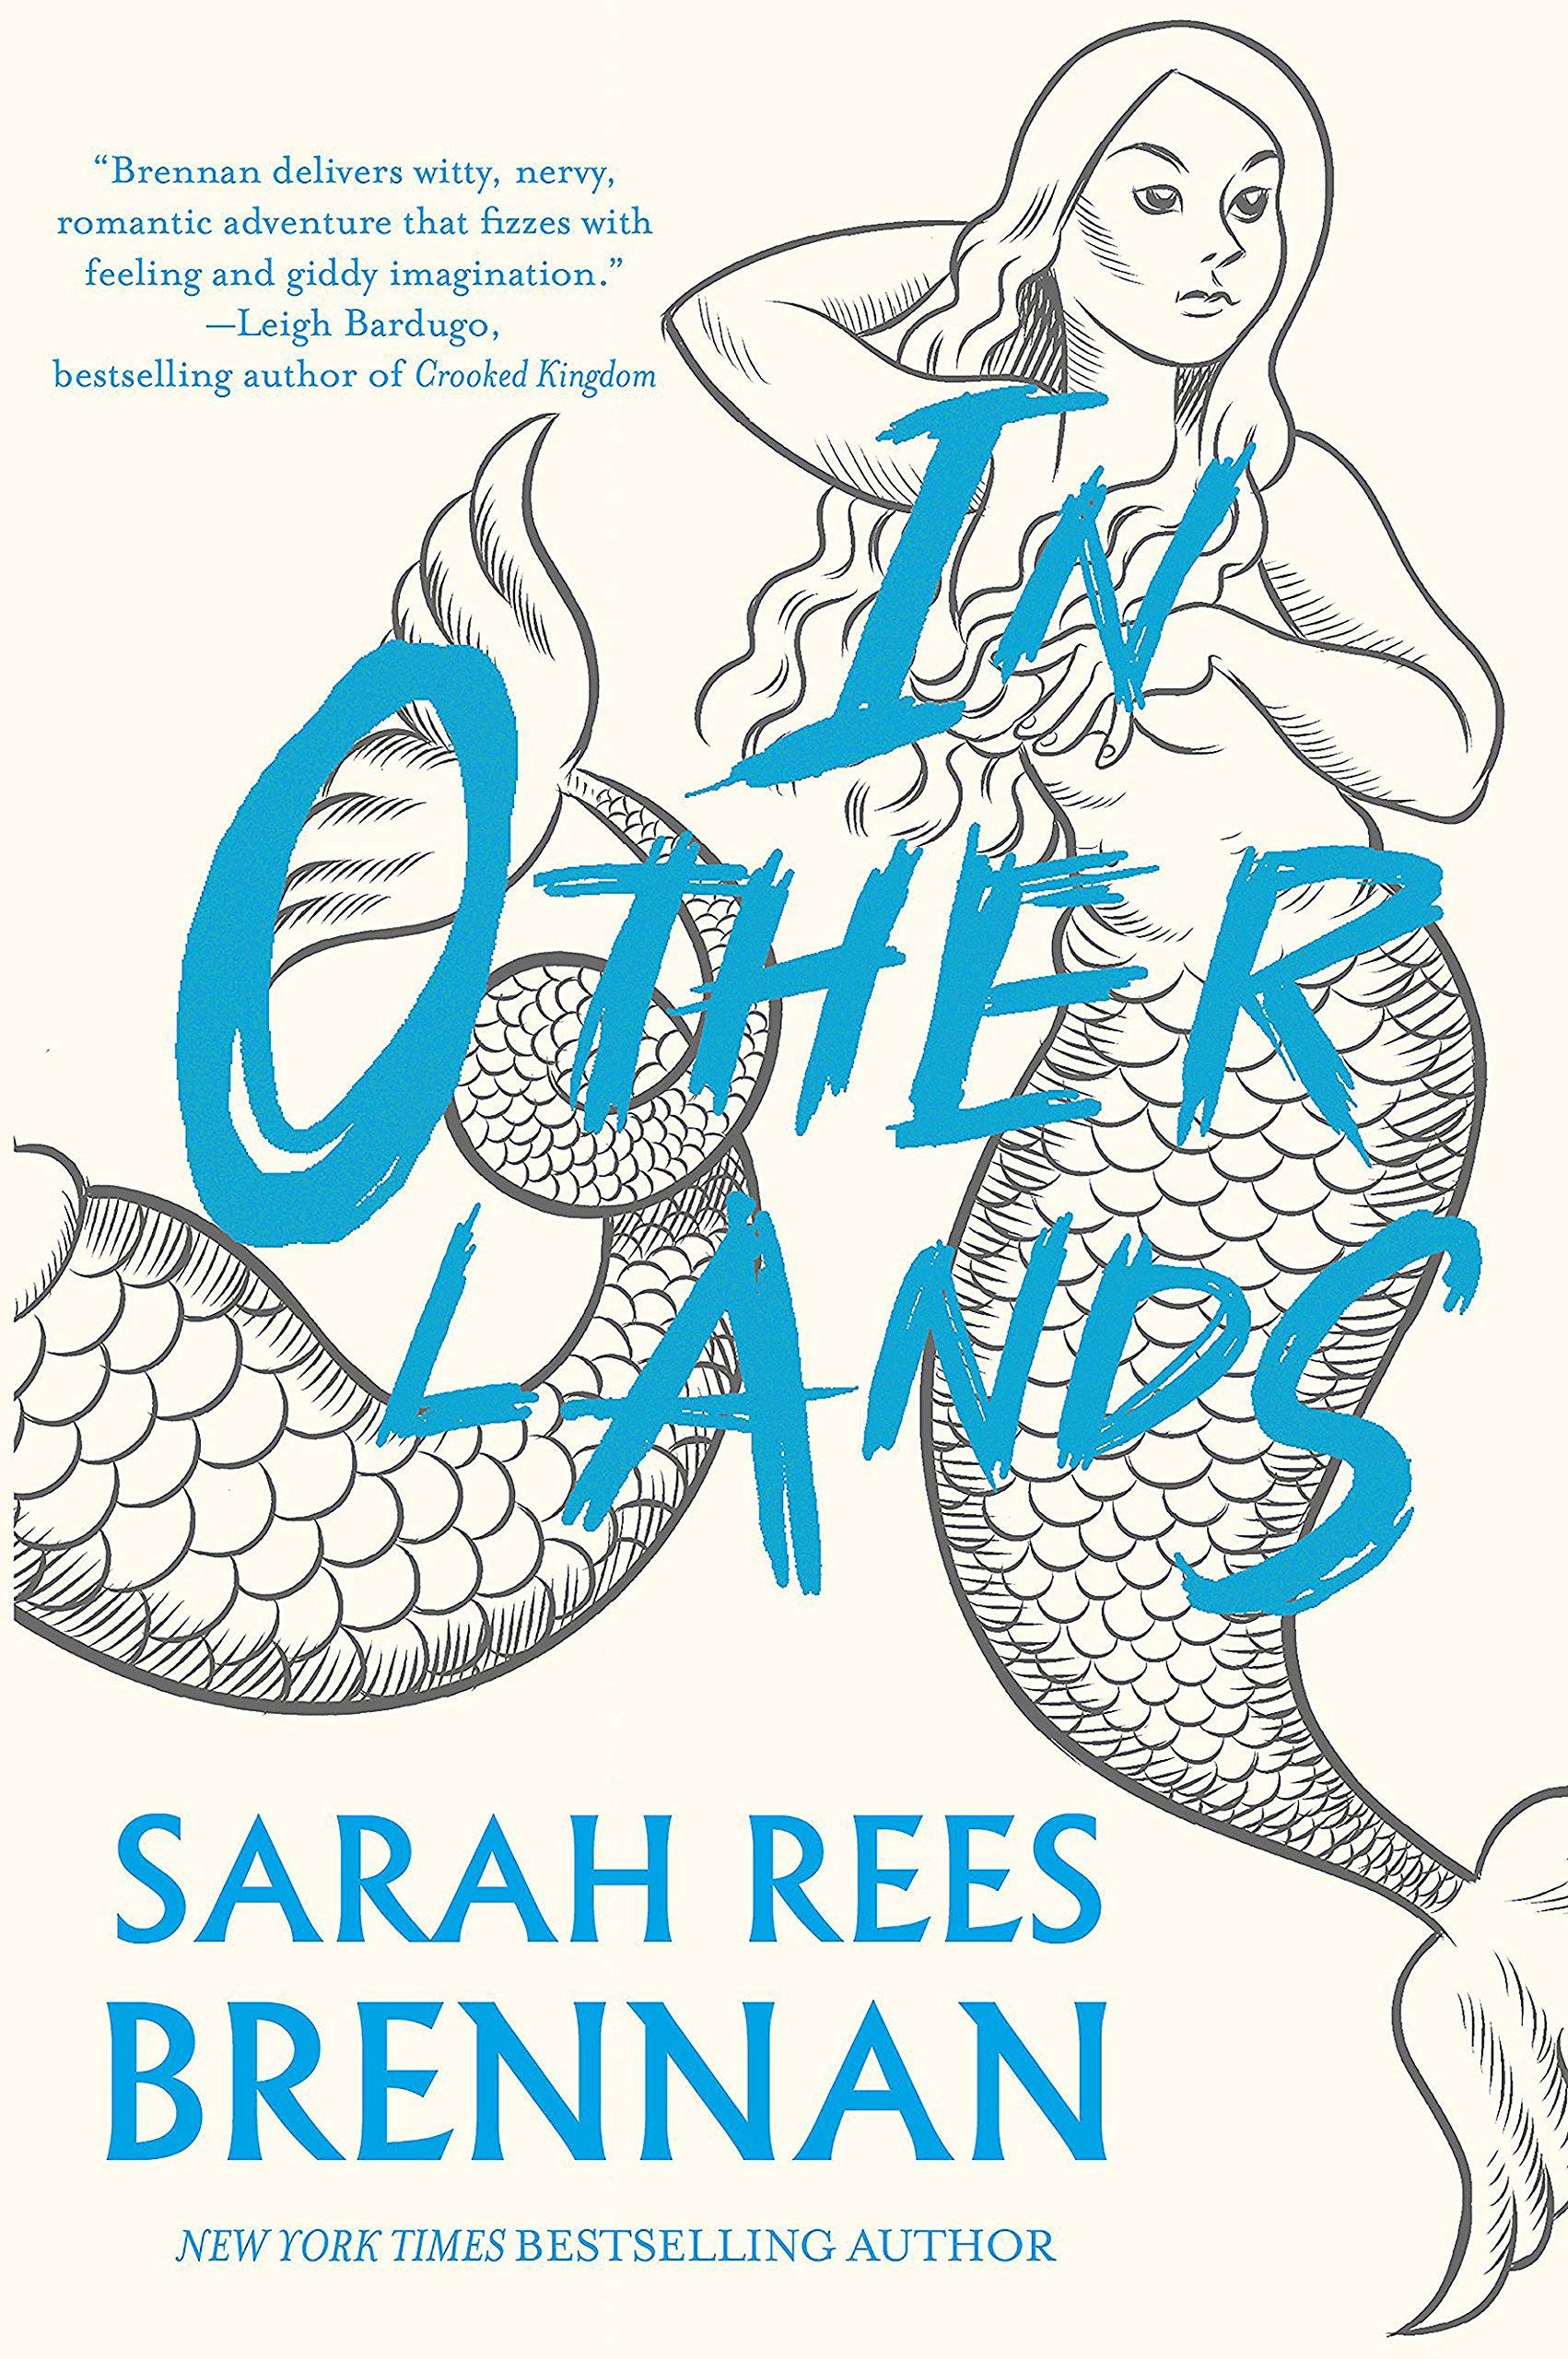 Amazon.com: In Other Lands (9781618731203): Brennan, Sarah Rees, Nowak,  Carolyn: Books